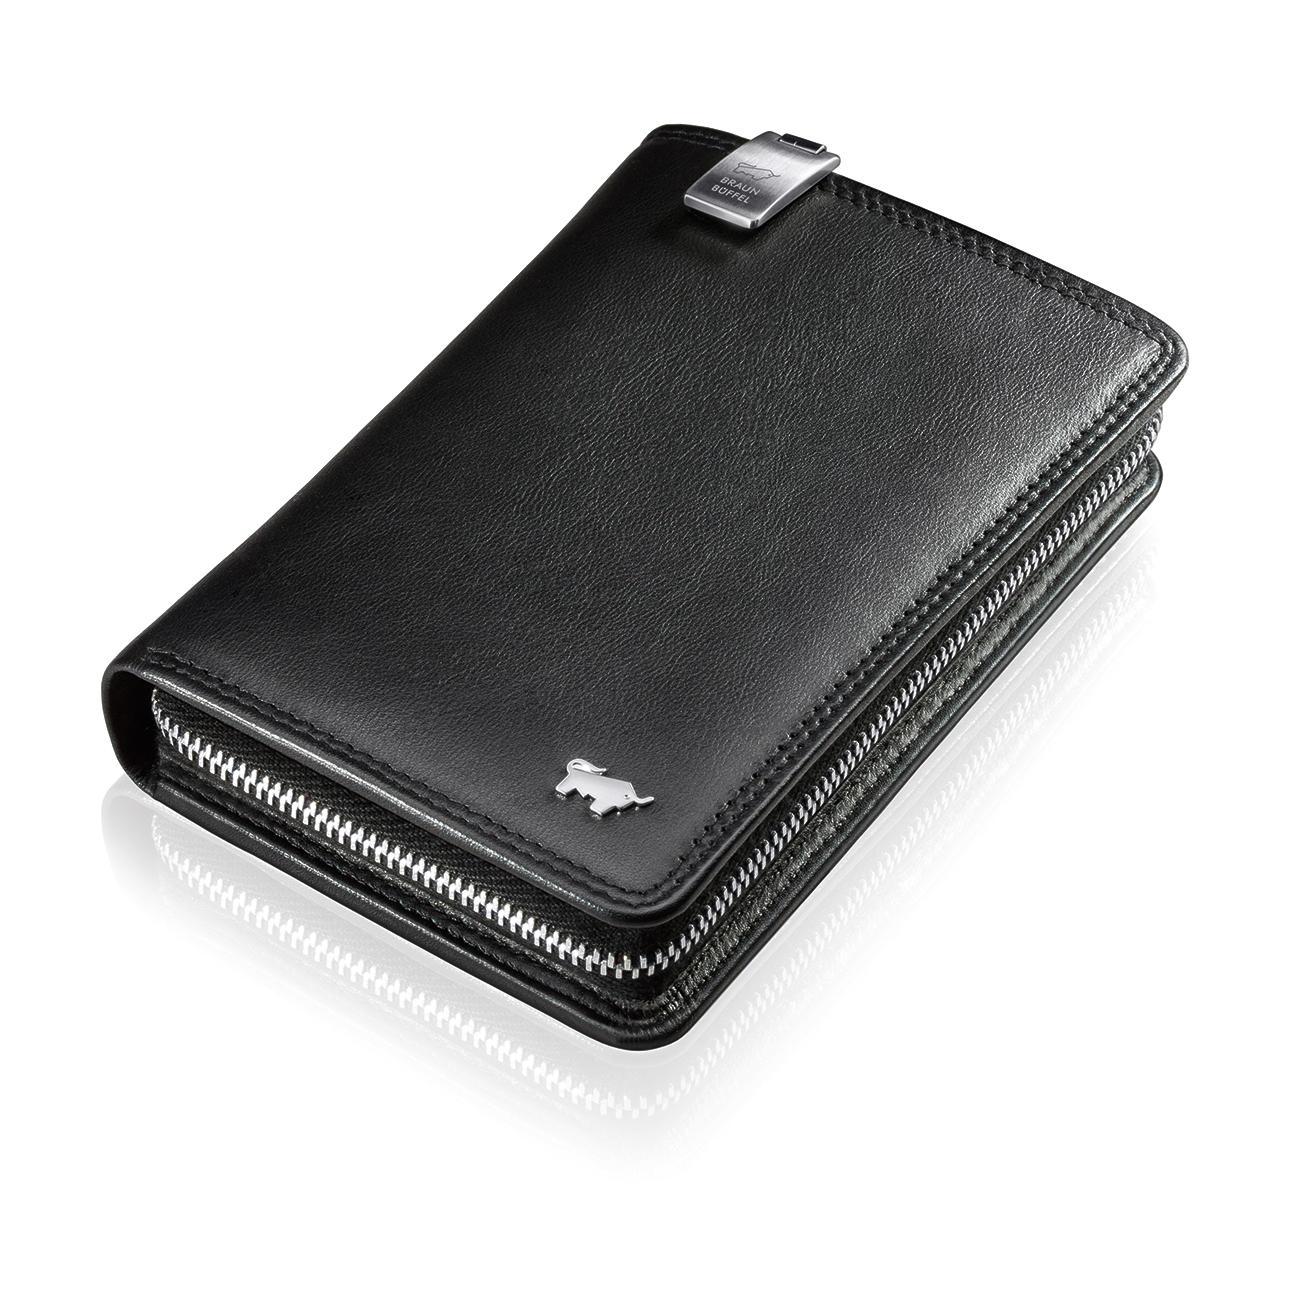 Acheter tui portefeuille braun b ffel en ligne pas cher - Acheter telephone portable payer en plusieur fois ...